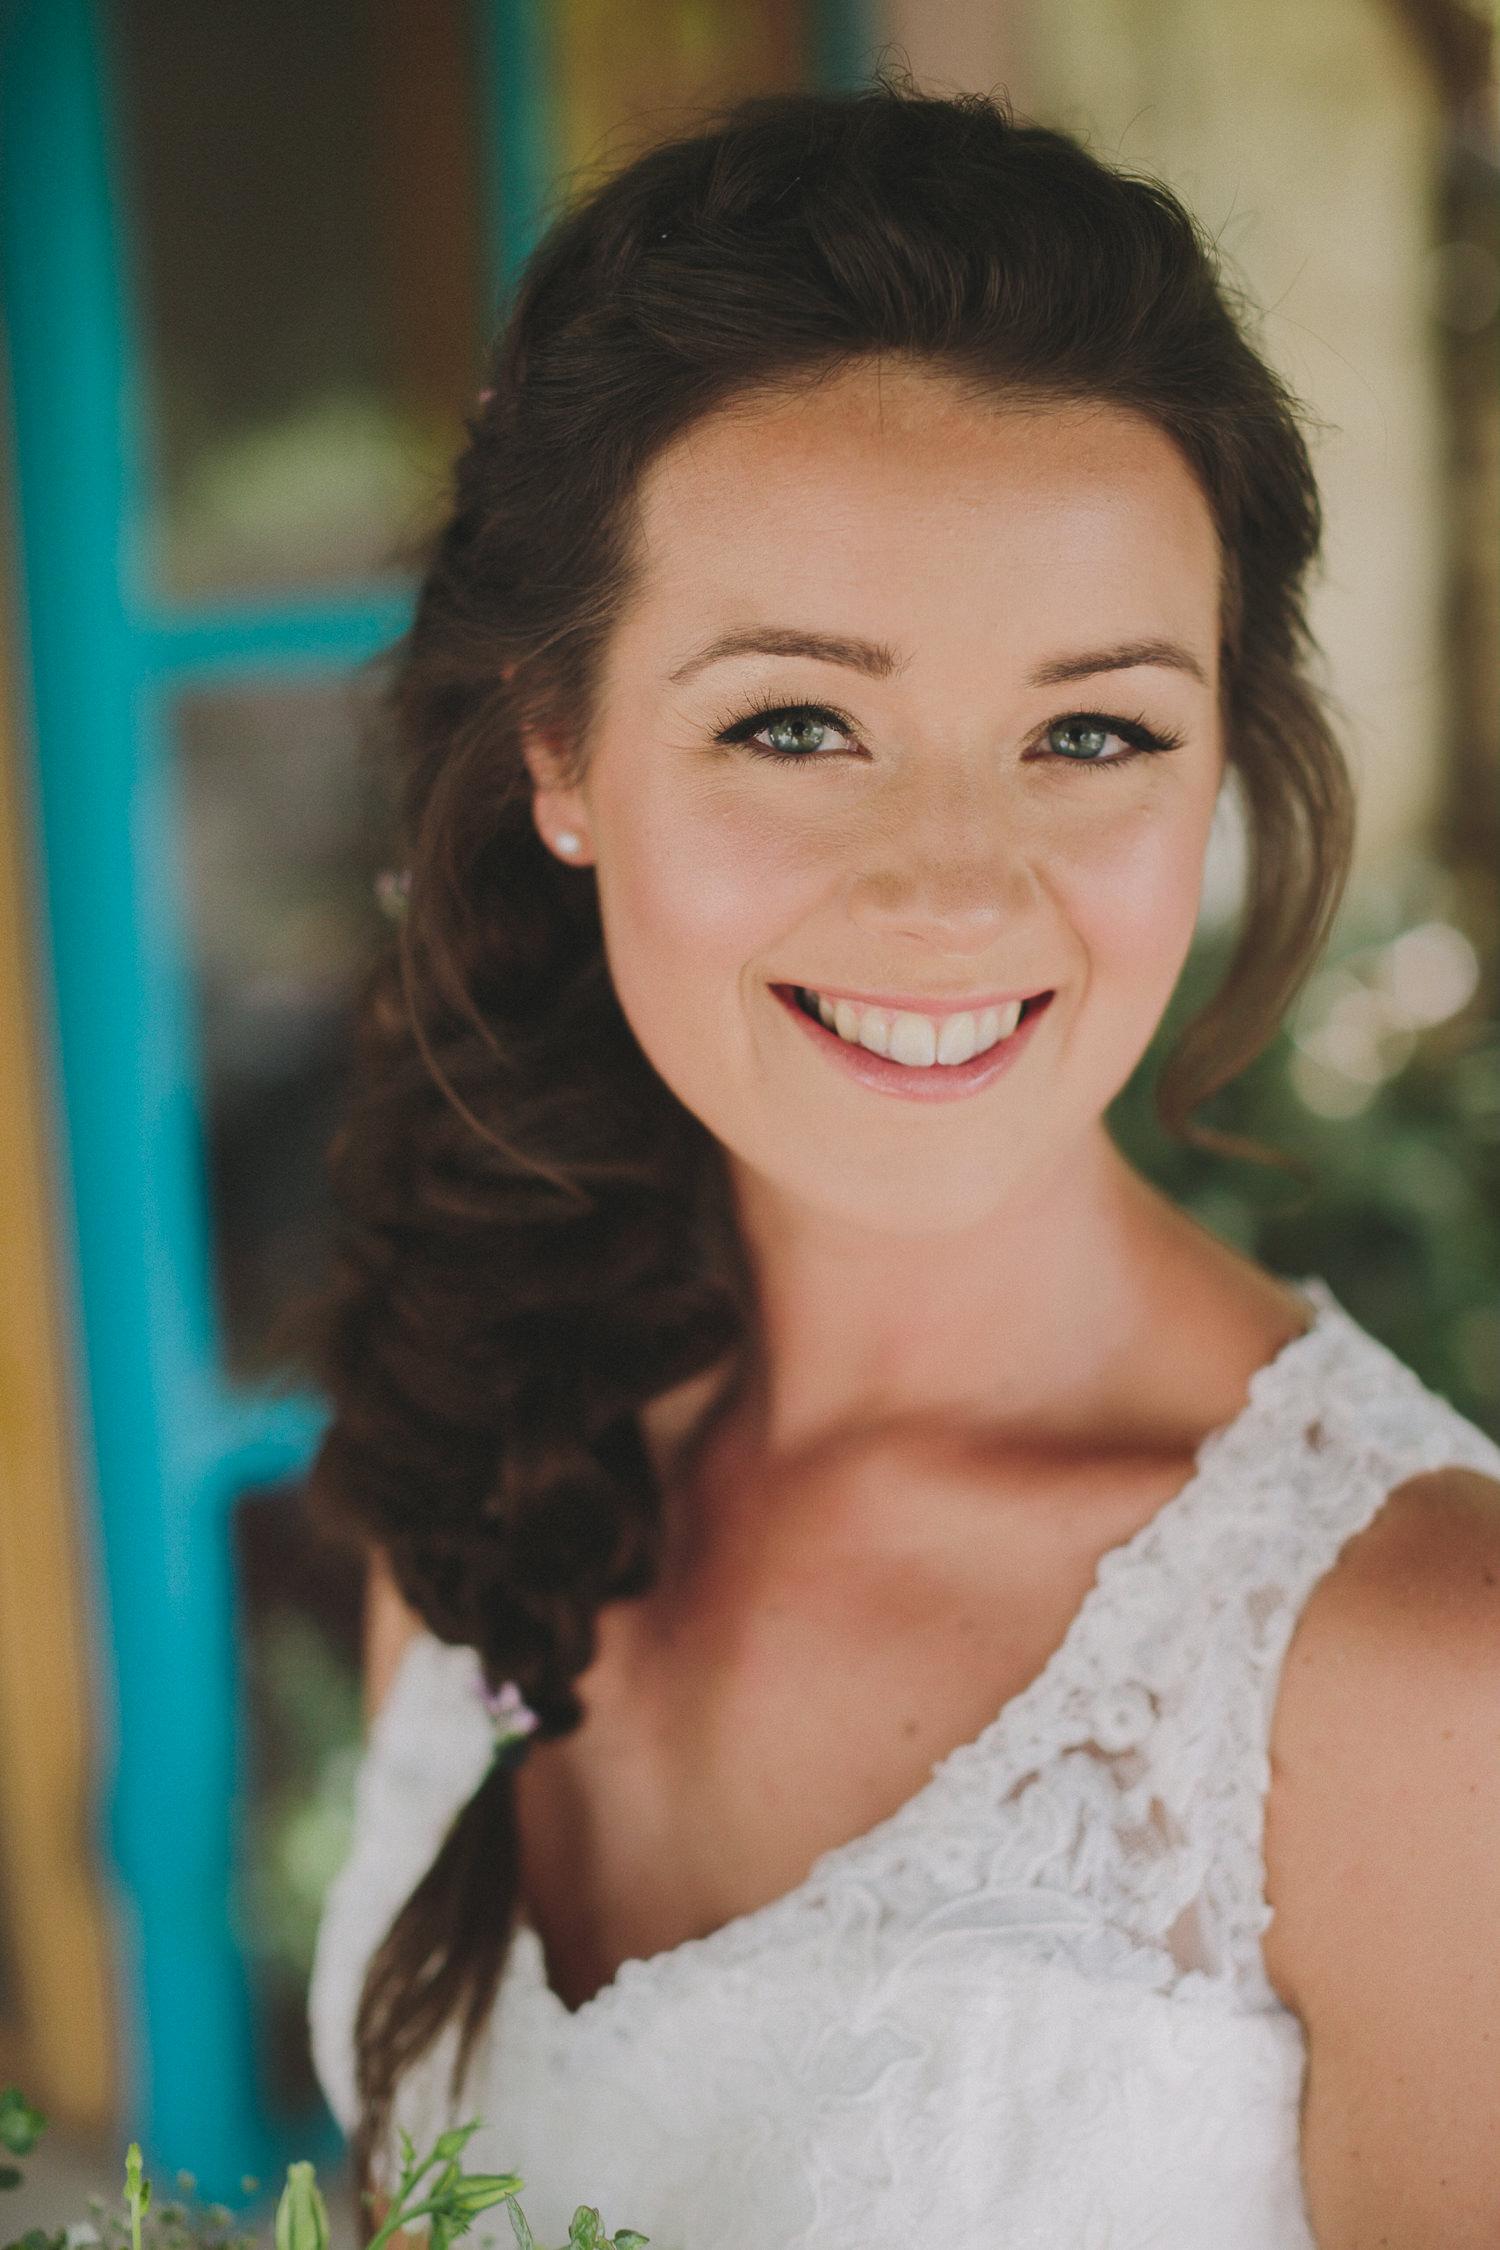 Countryside Wedding - Liron Erel - Echoes & Wildhearts 0019.jpg